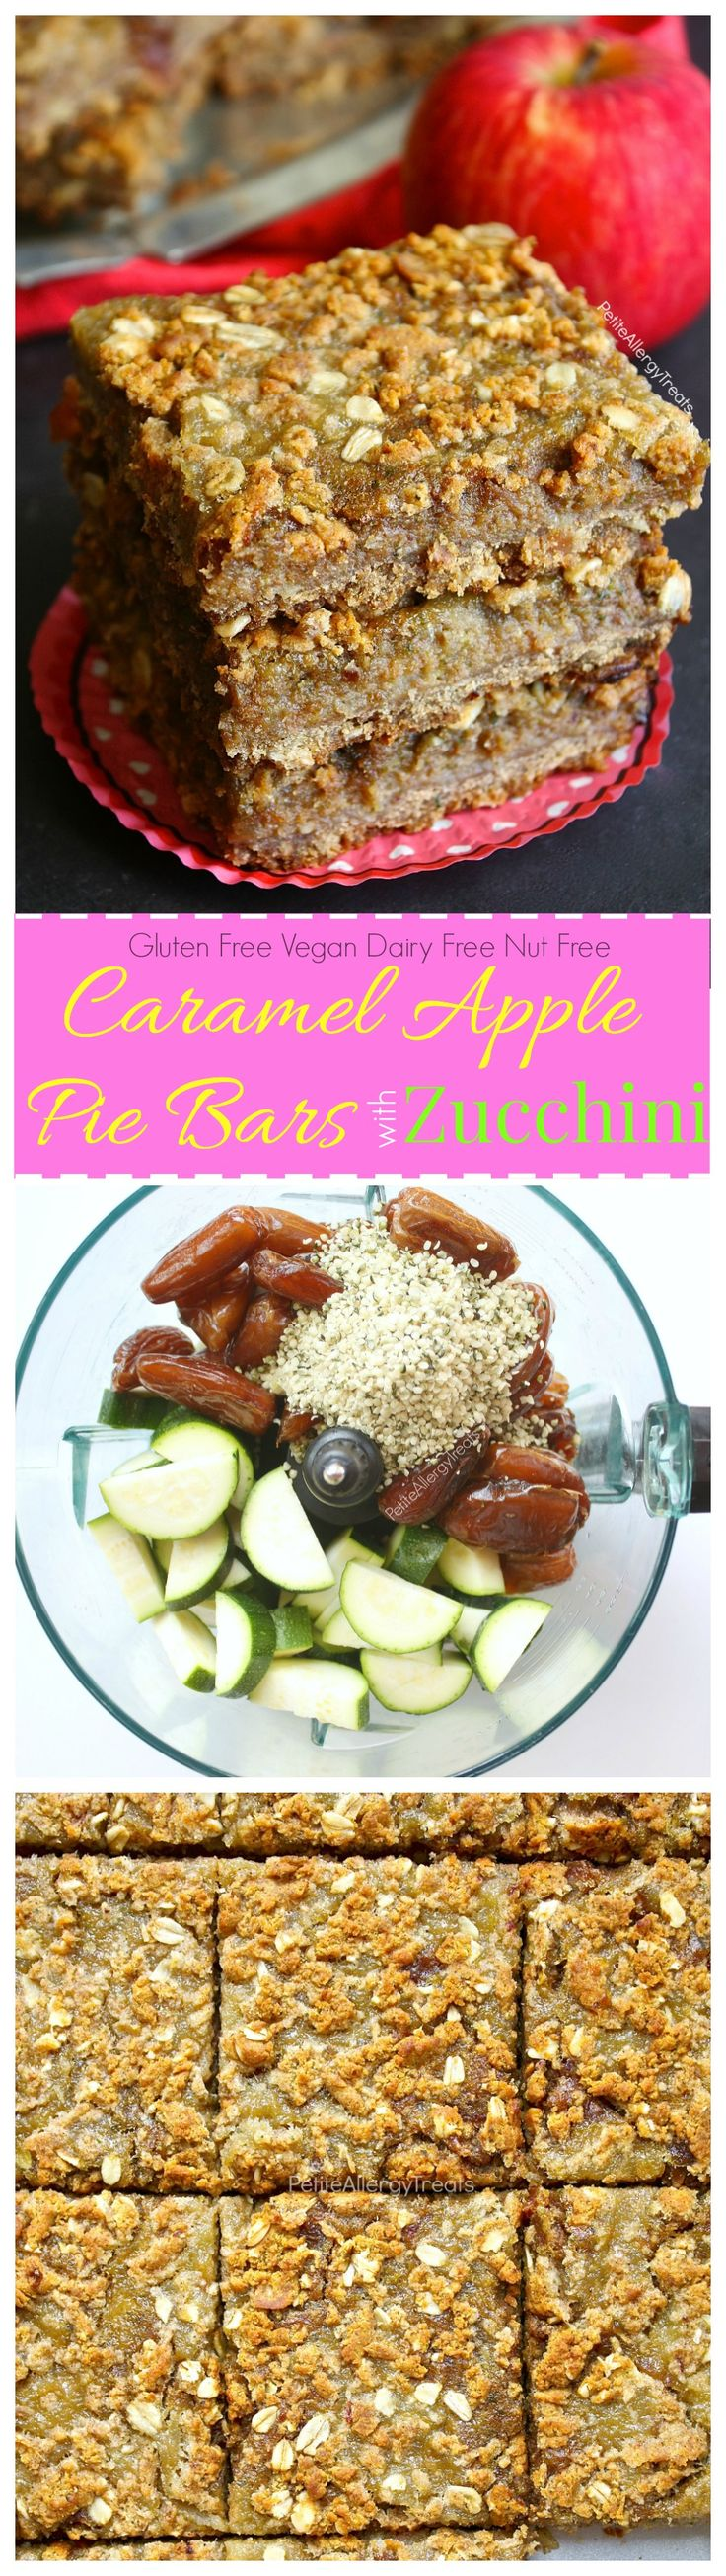 Gluten Free Caramel Apple Pie Bars Recipe (vegan dairy free)- Apple pie meets healthy zucchini and dates!